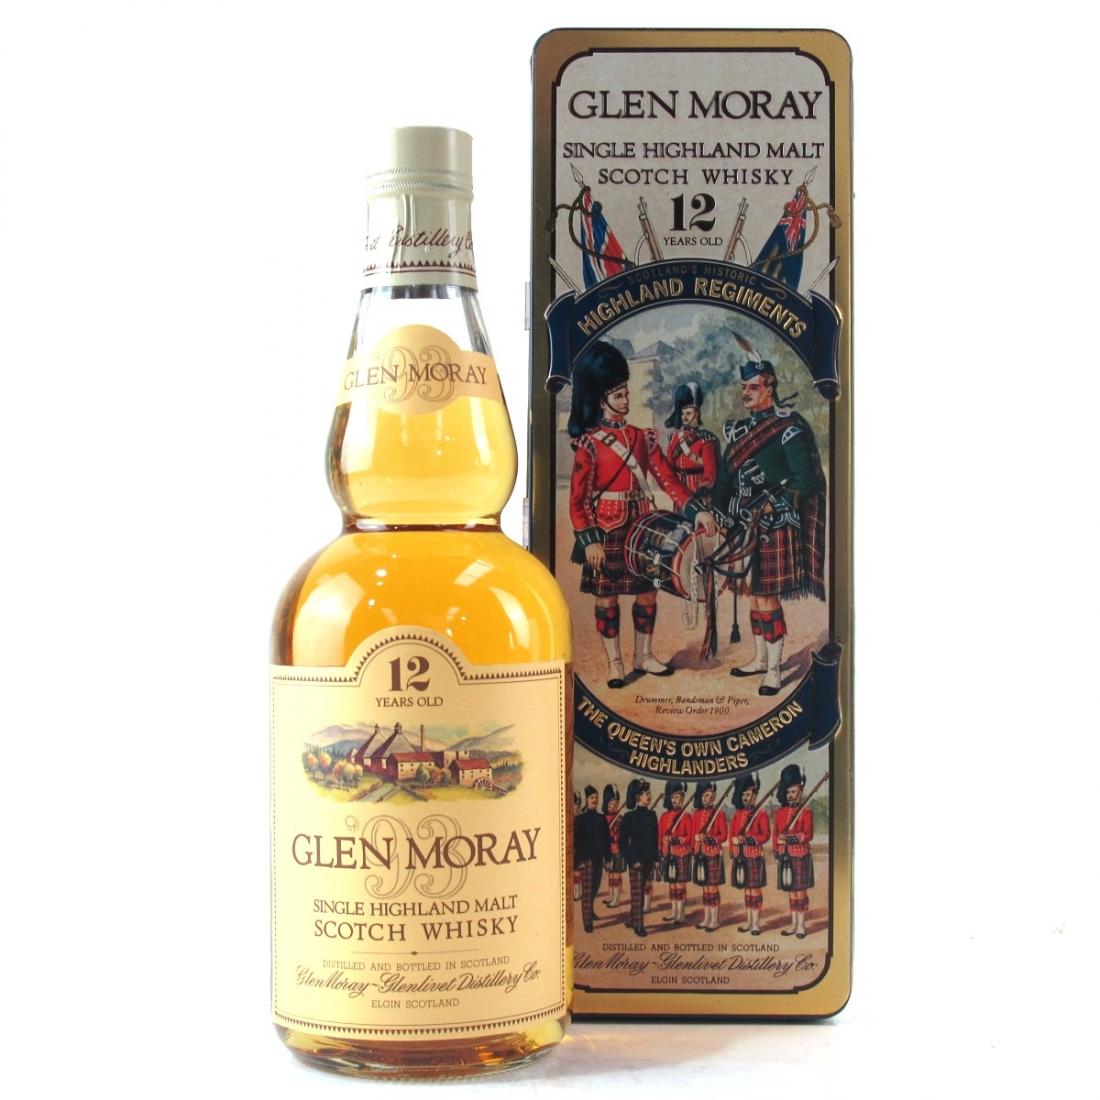 Glen Moray 12 Year Old / Queen's Own Cameron Highlanders